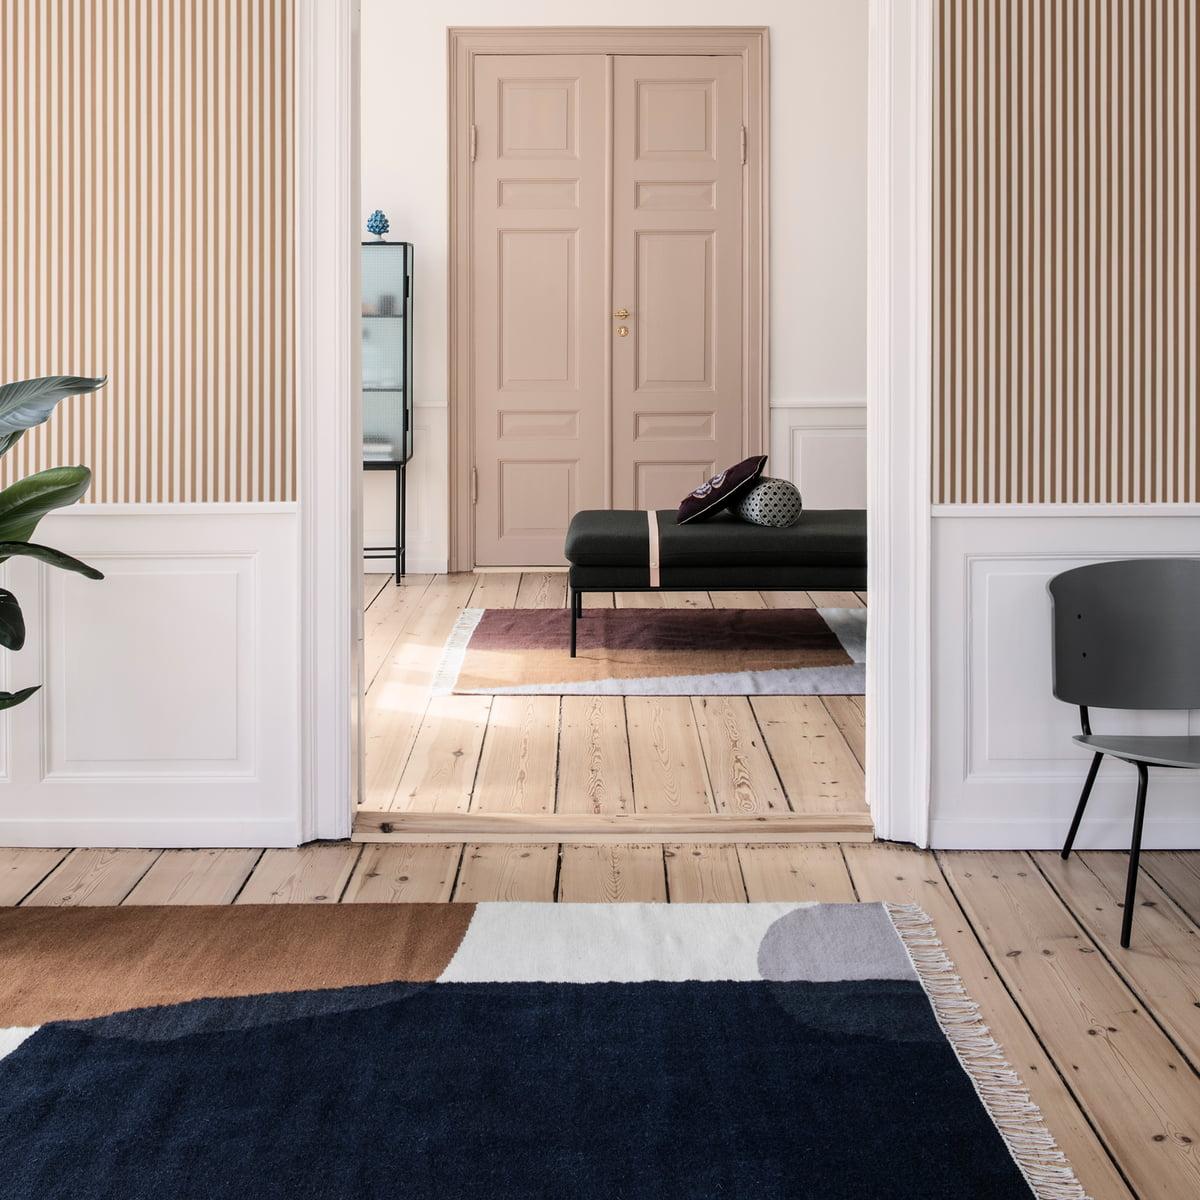 kelim rug merge von ferm living connox. Black Bedroom Furniture Sets. Home Design Ideas